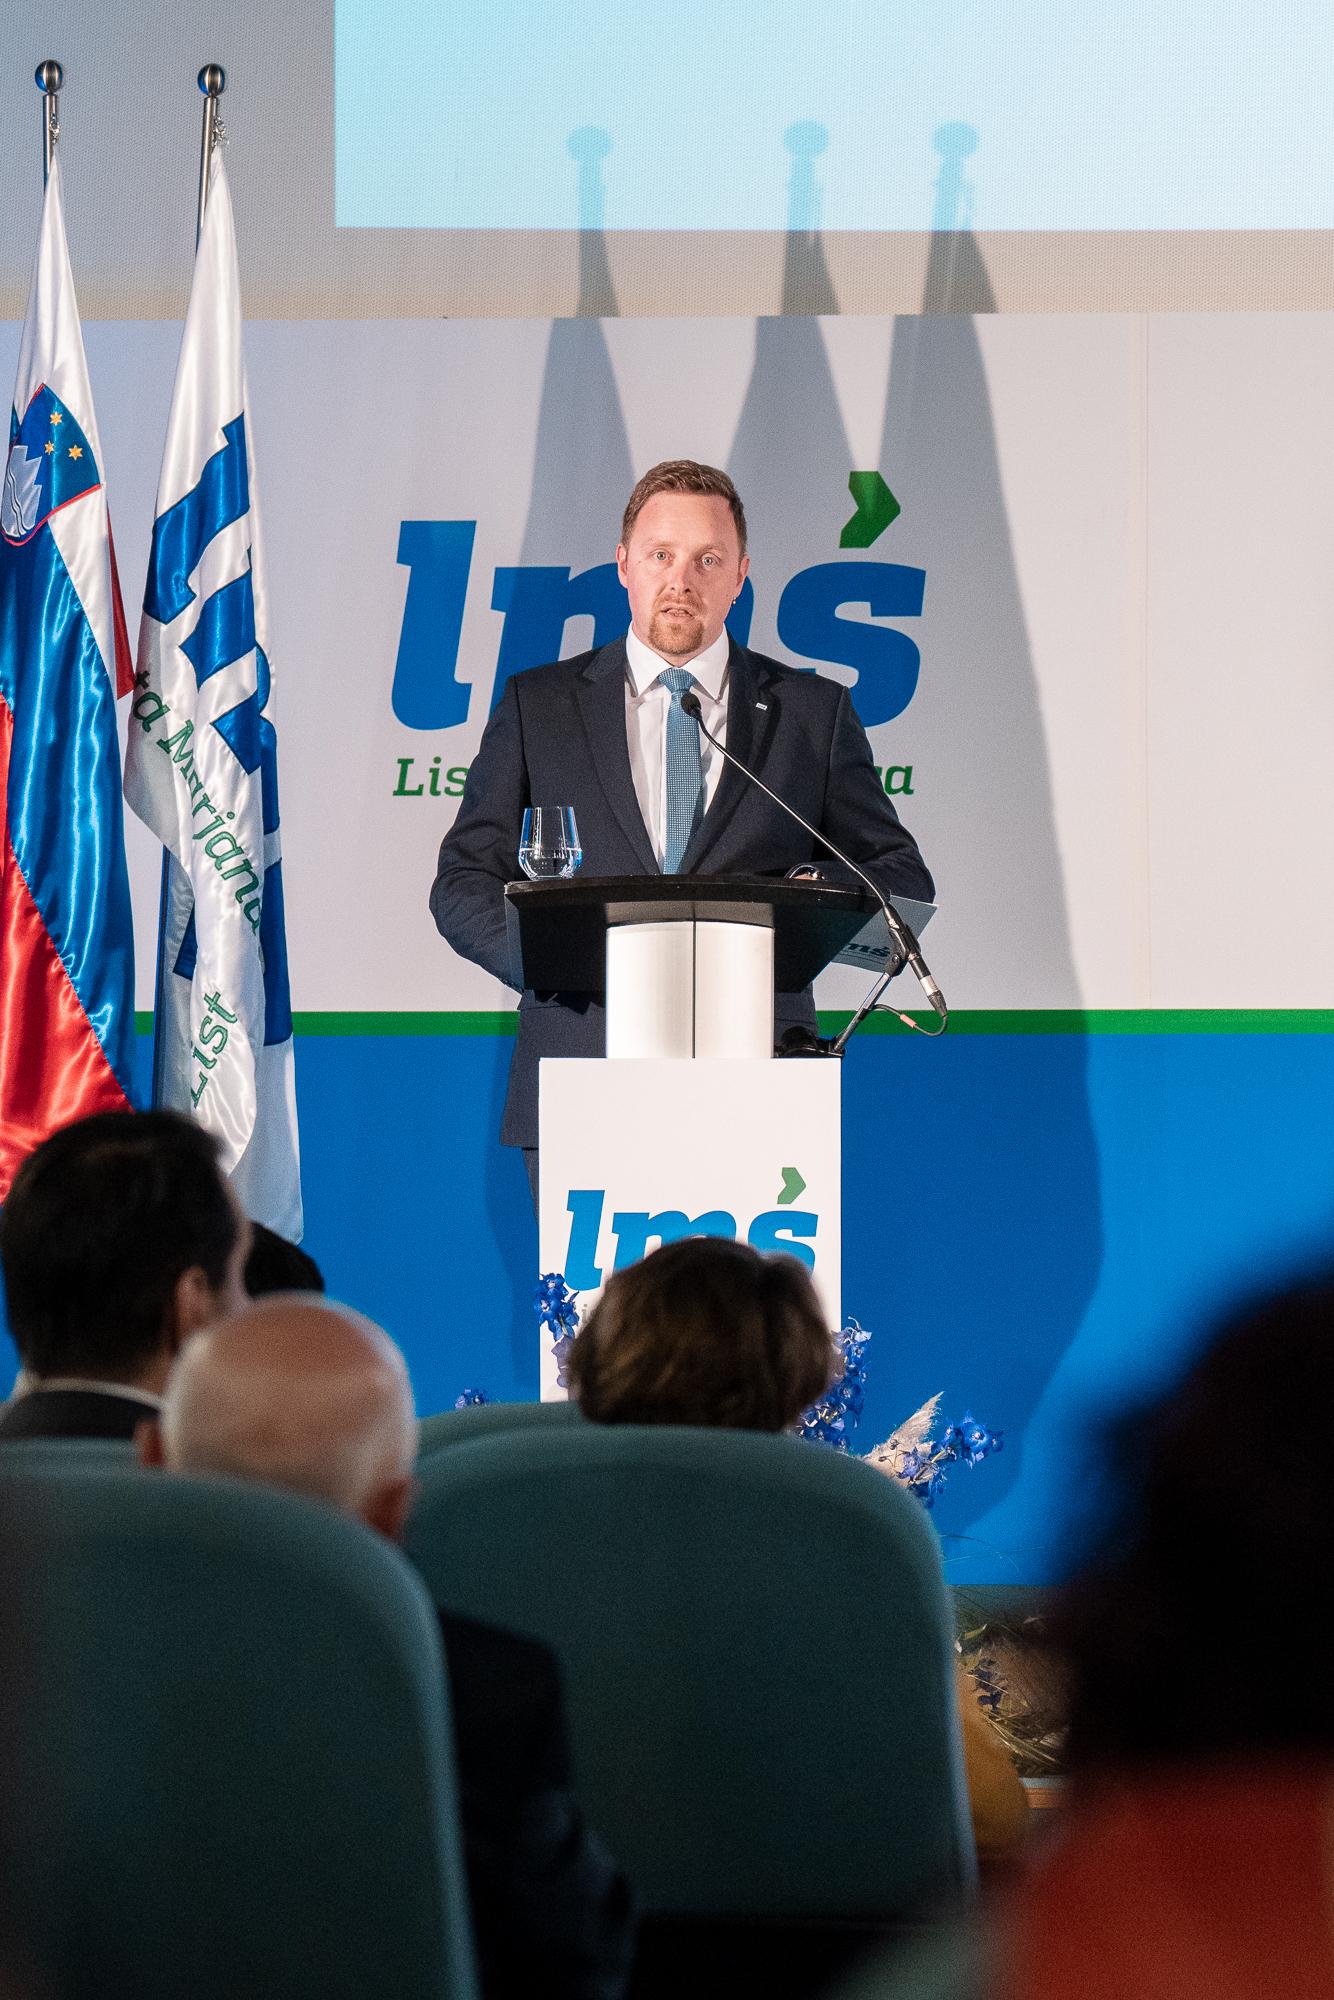 Igor Žavbi, vice president of Lista Marjana Šarca, on the stage at the Fifth Congress of Lista Marjana Šarca in Trbovlje